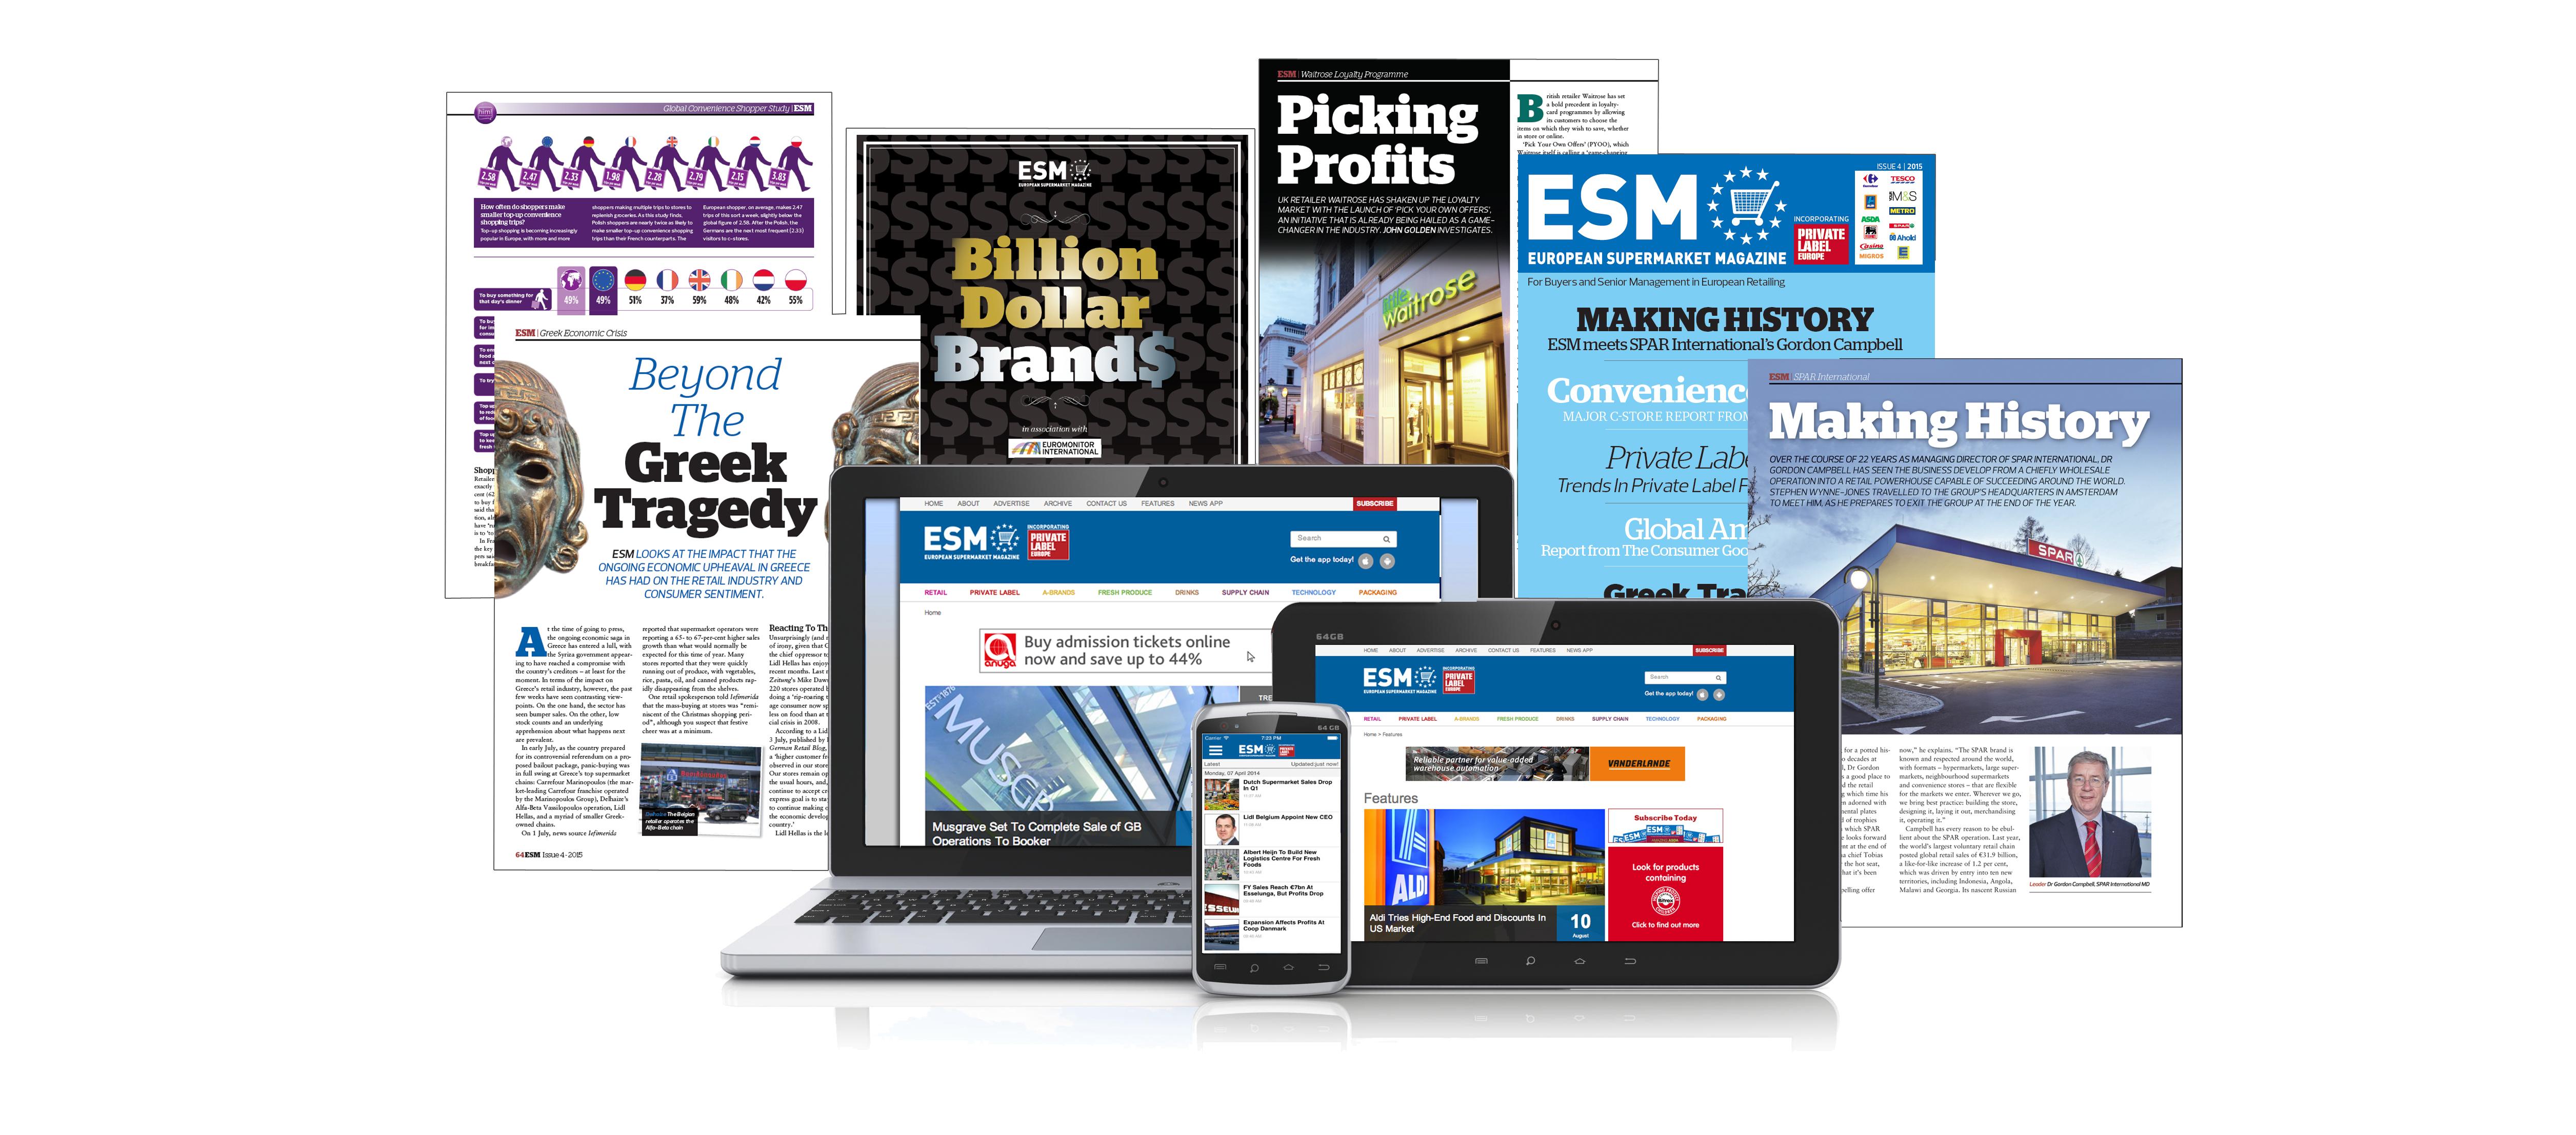 ESM-Advertise